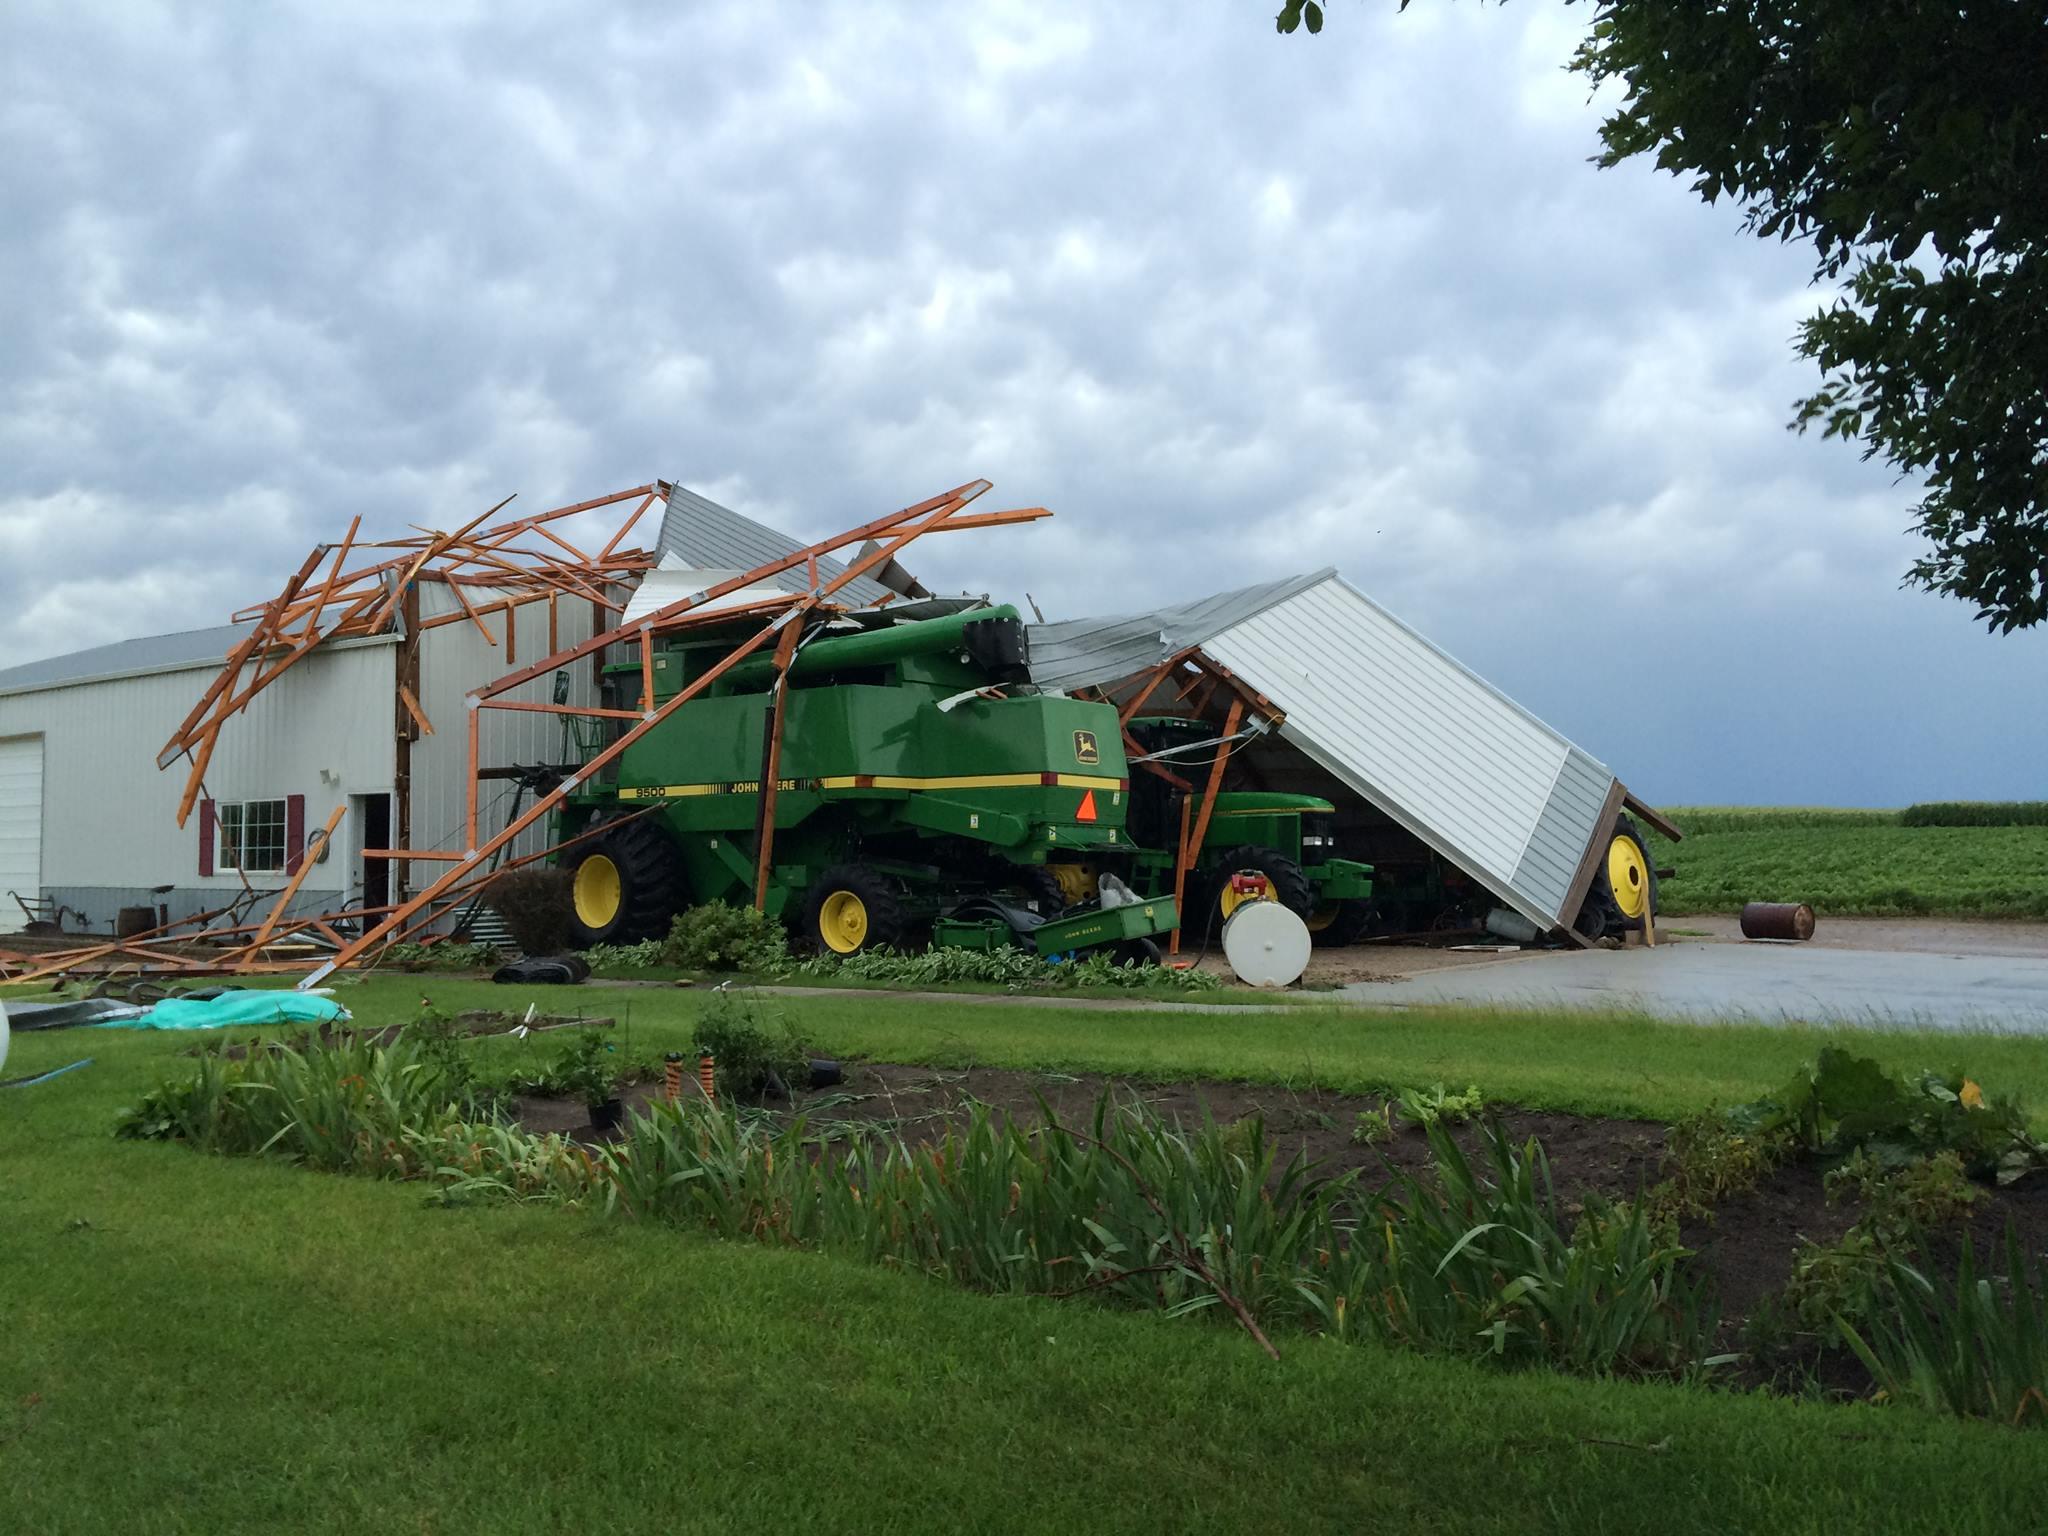 Storm damage between Gilbertville and Raymond